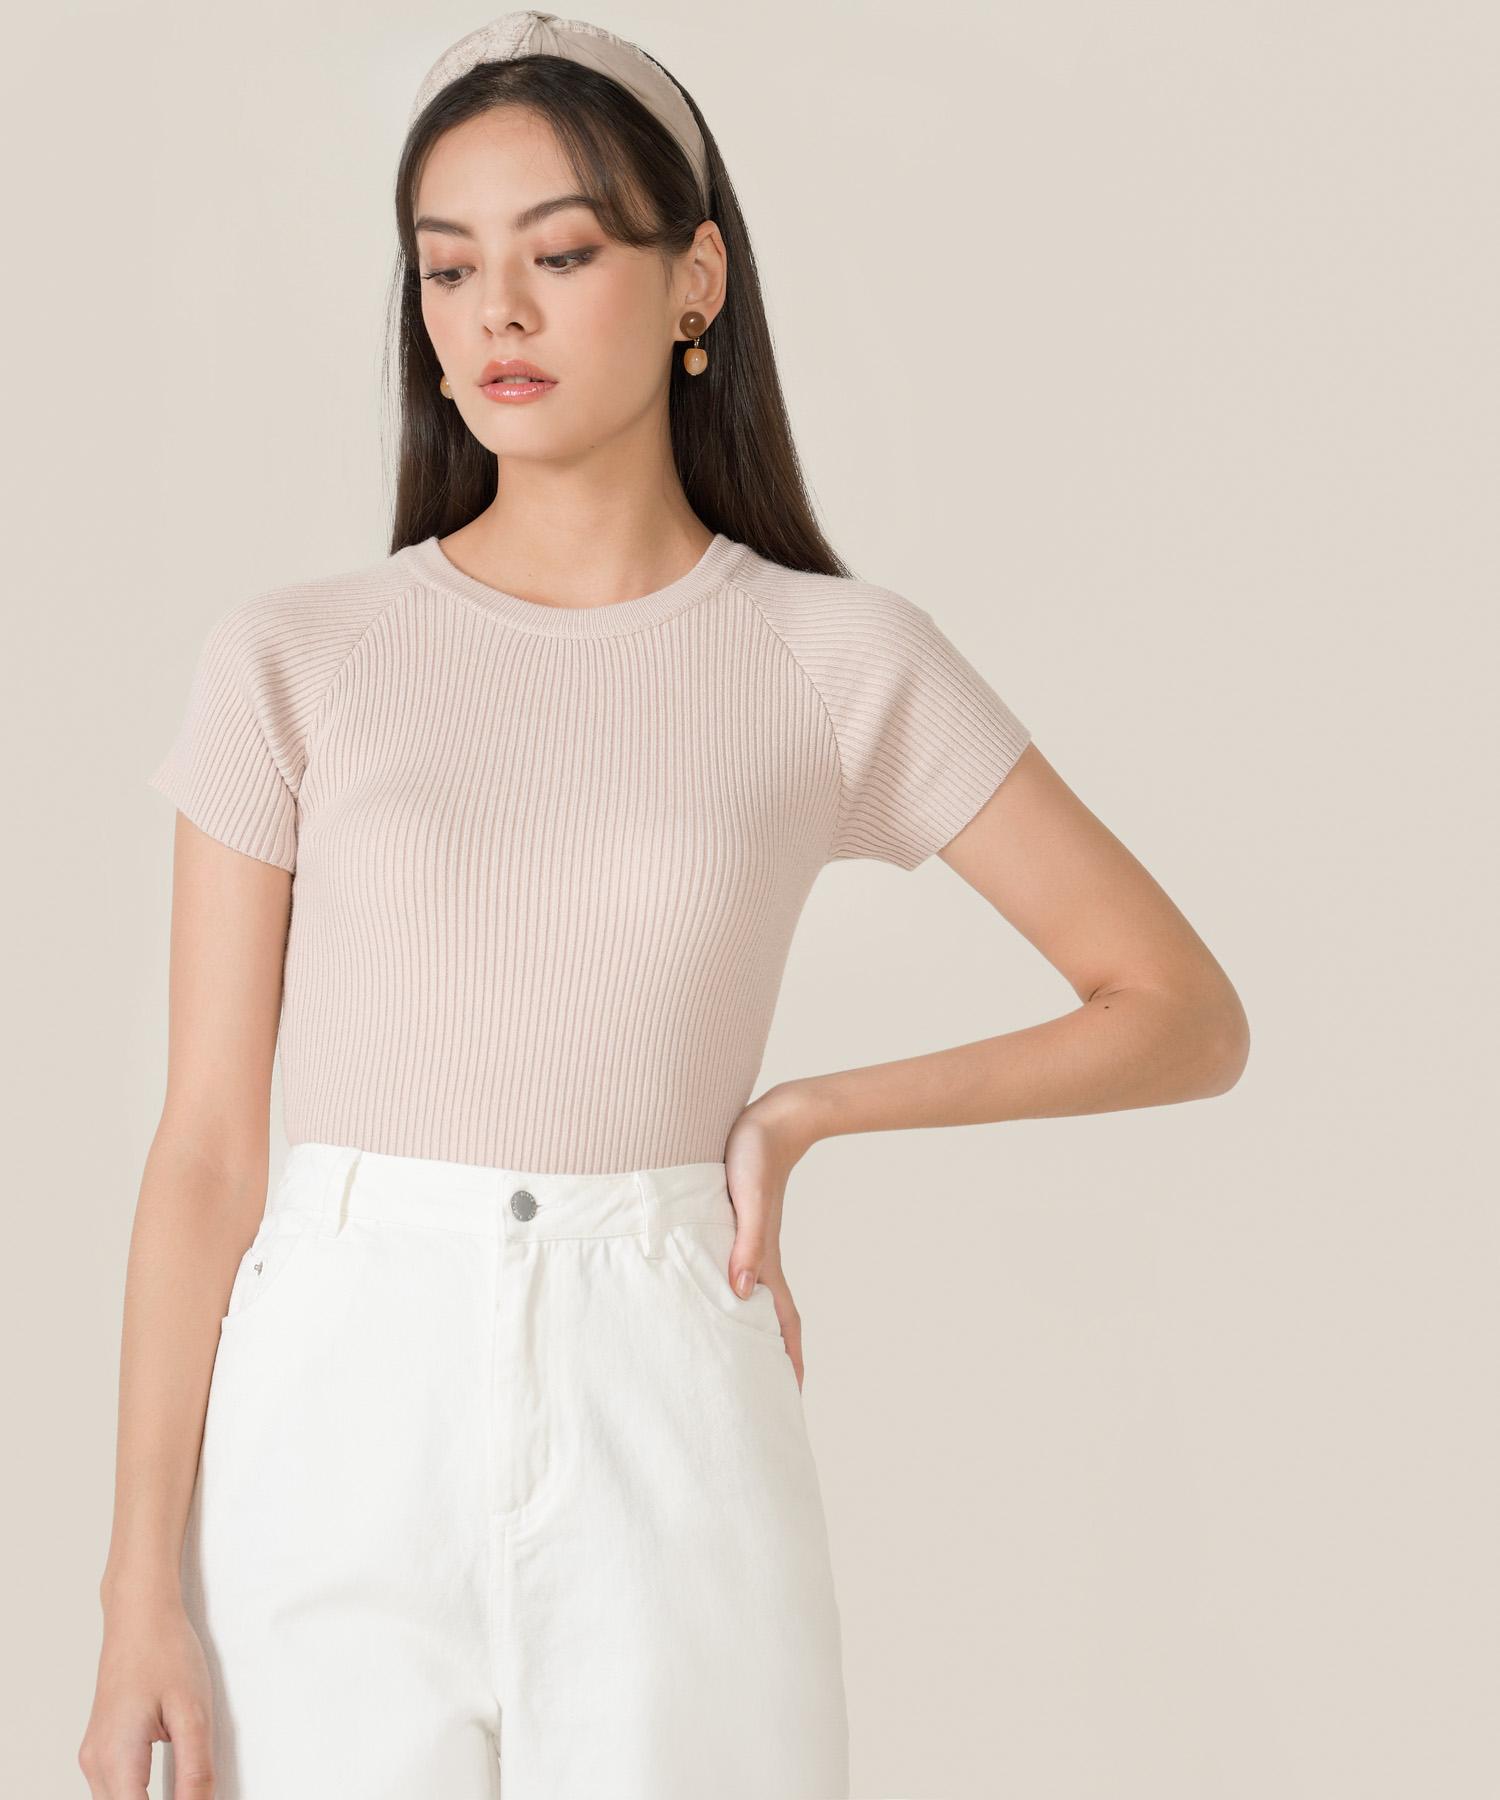 etta-knit-twist-back-top-pale-blush-1